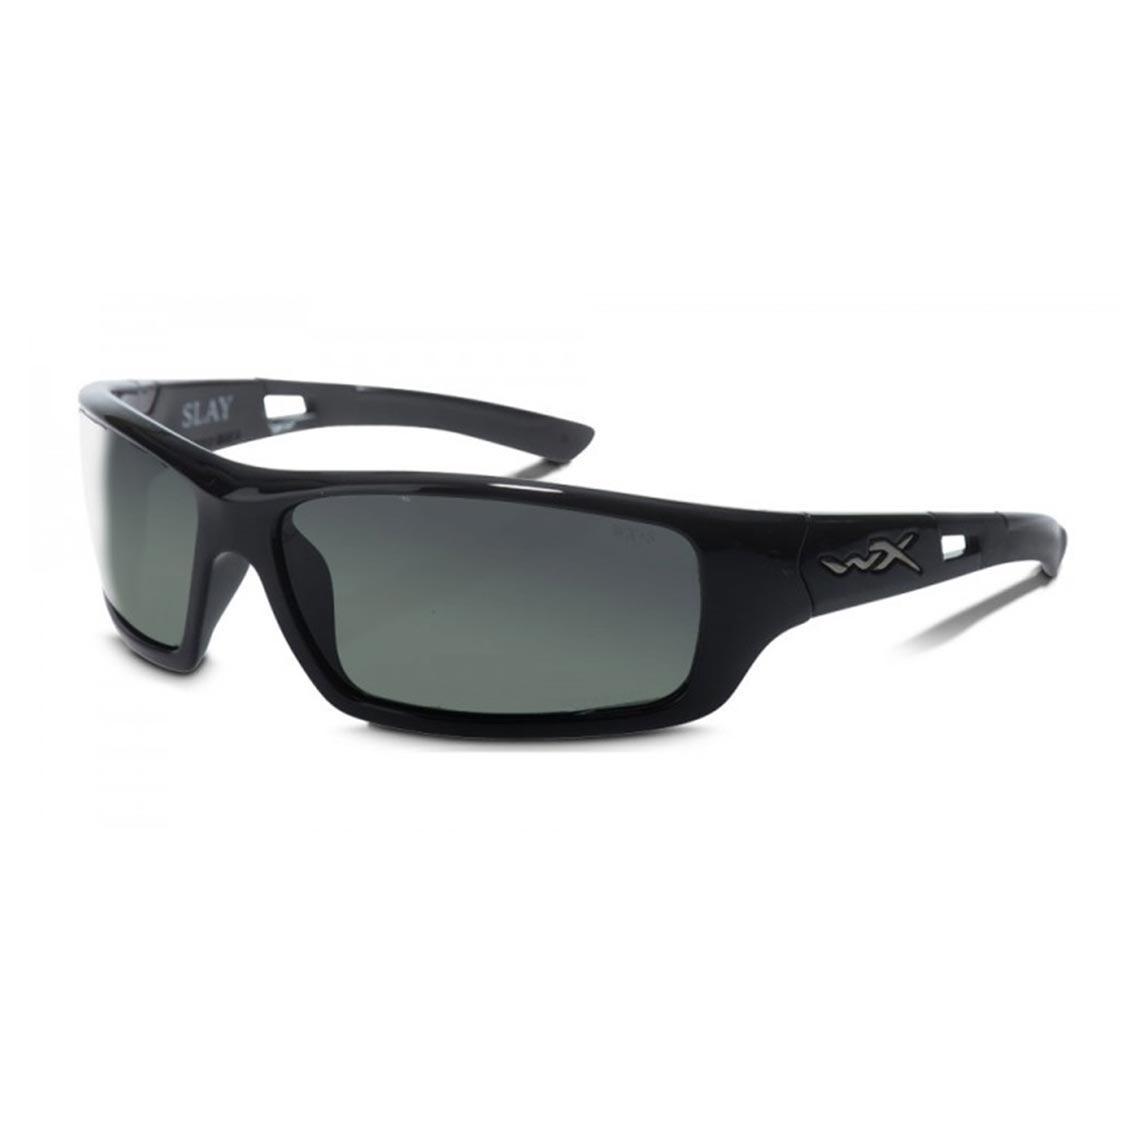 f5061be03aac WX Slay - Eye Lab RX